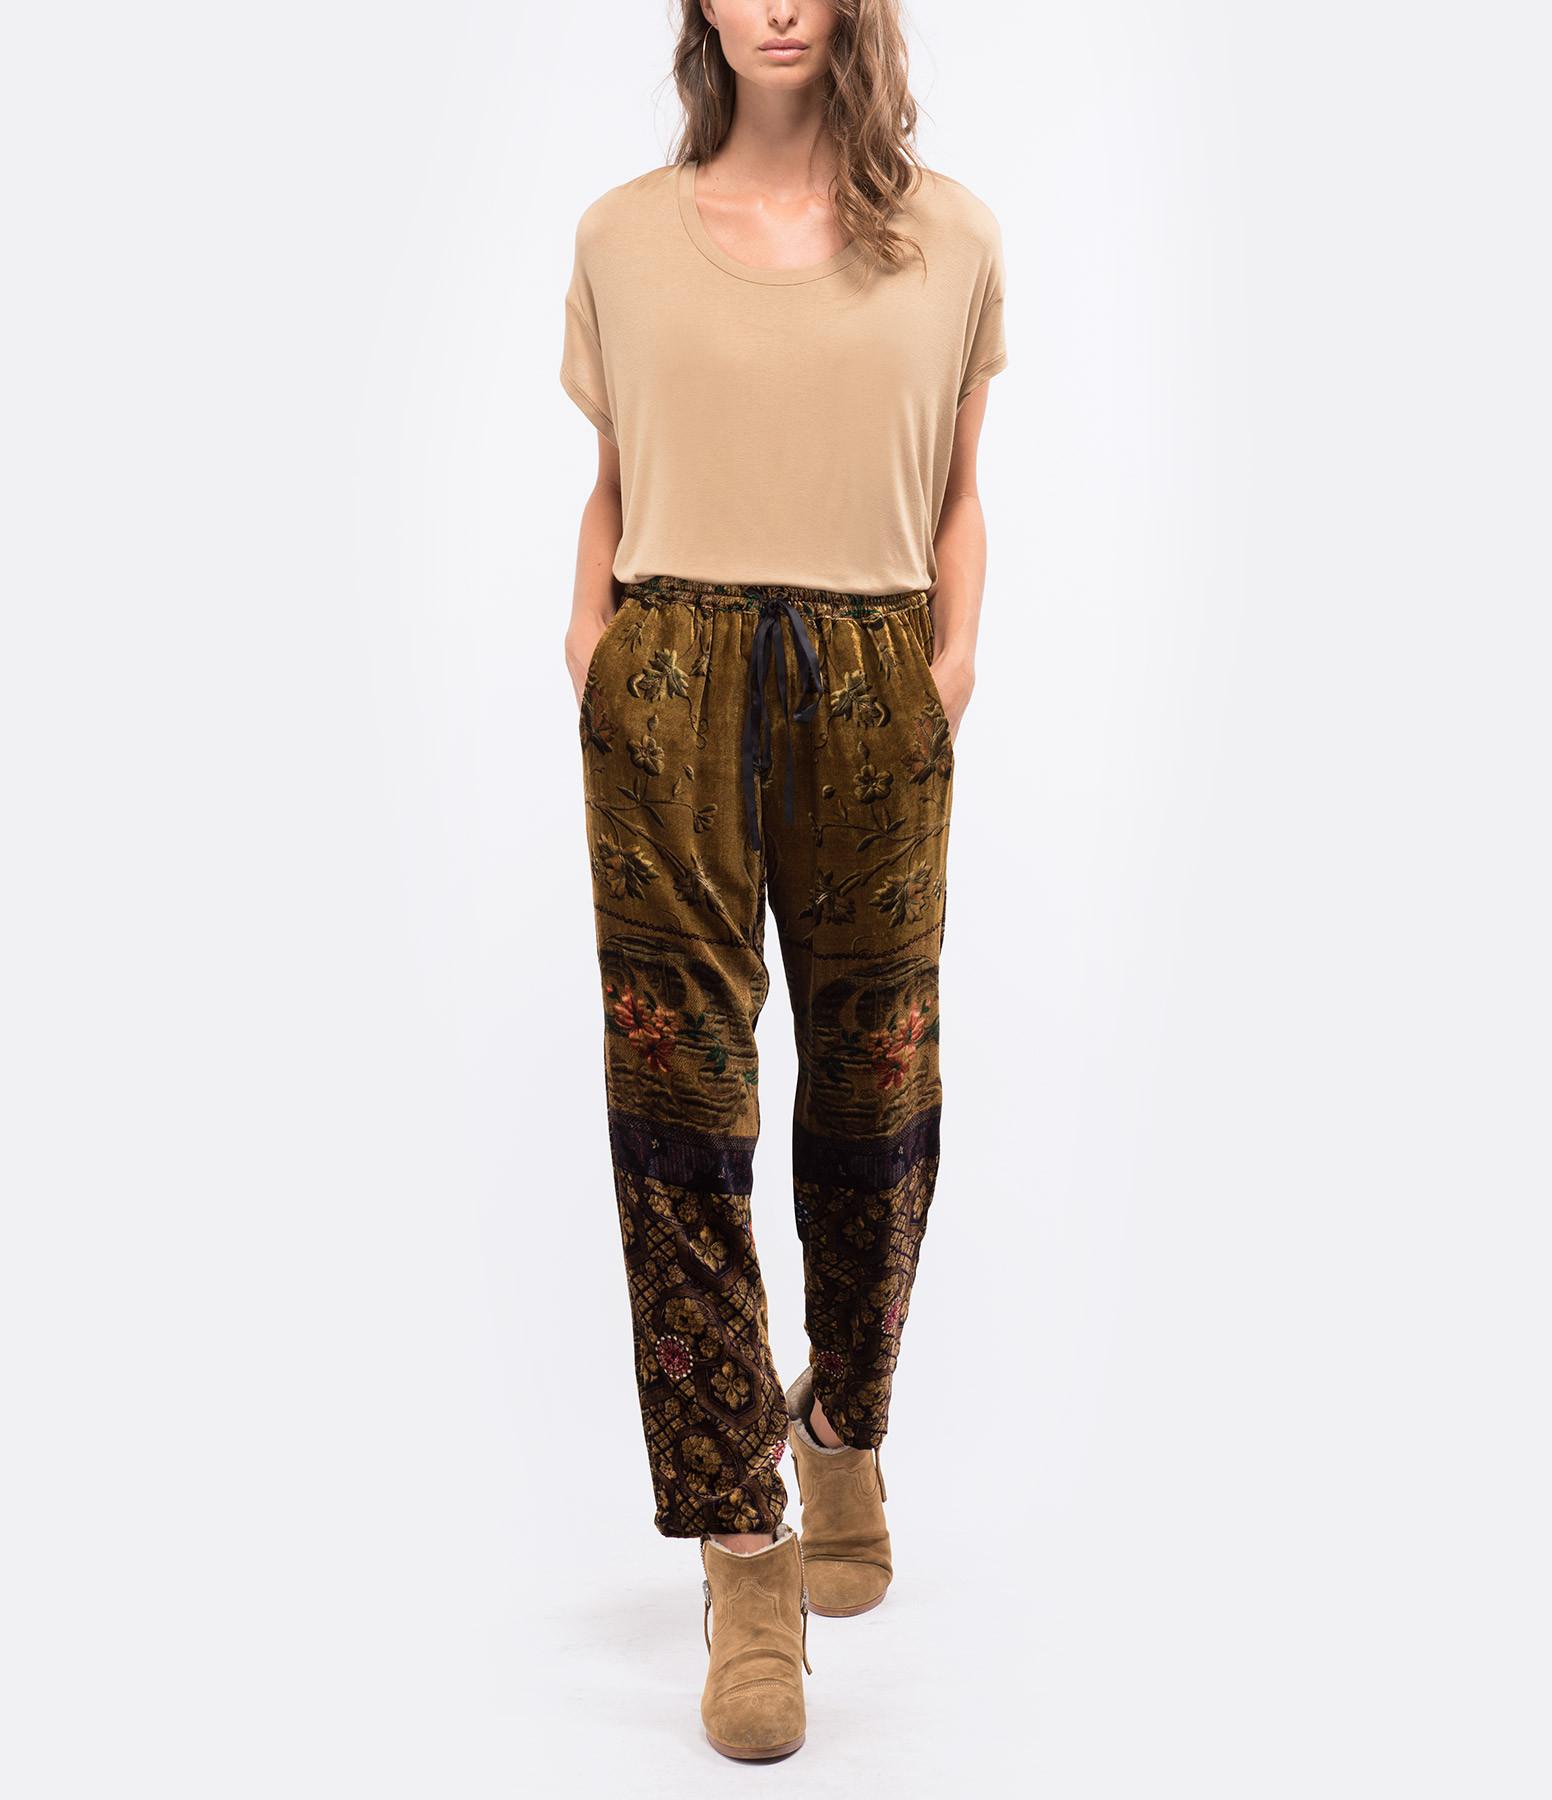 MARGAUX LONNBERG - Tee-shirt Marlow Coton Camel